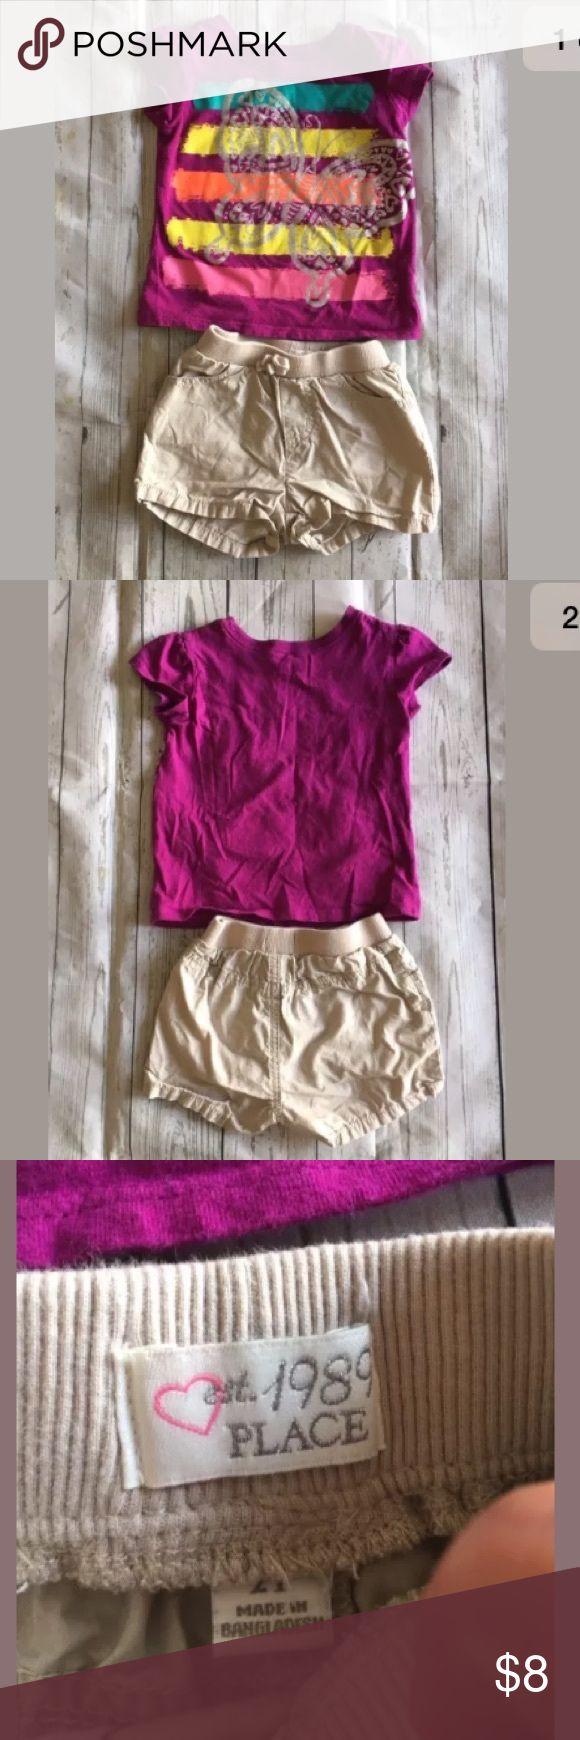 Children's Place Purple Shirt Beige Shorts Outfit Children's Place Purple Graphic Short Sleeve Shirt Beige Shorts Outfit Set 2T Children's Place Matching Sets